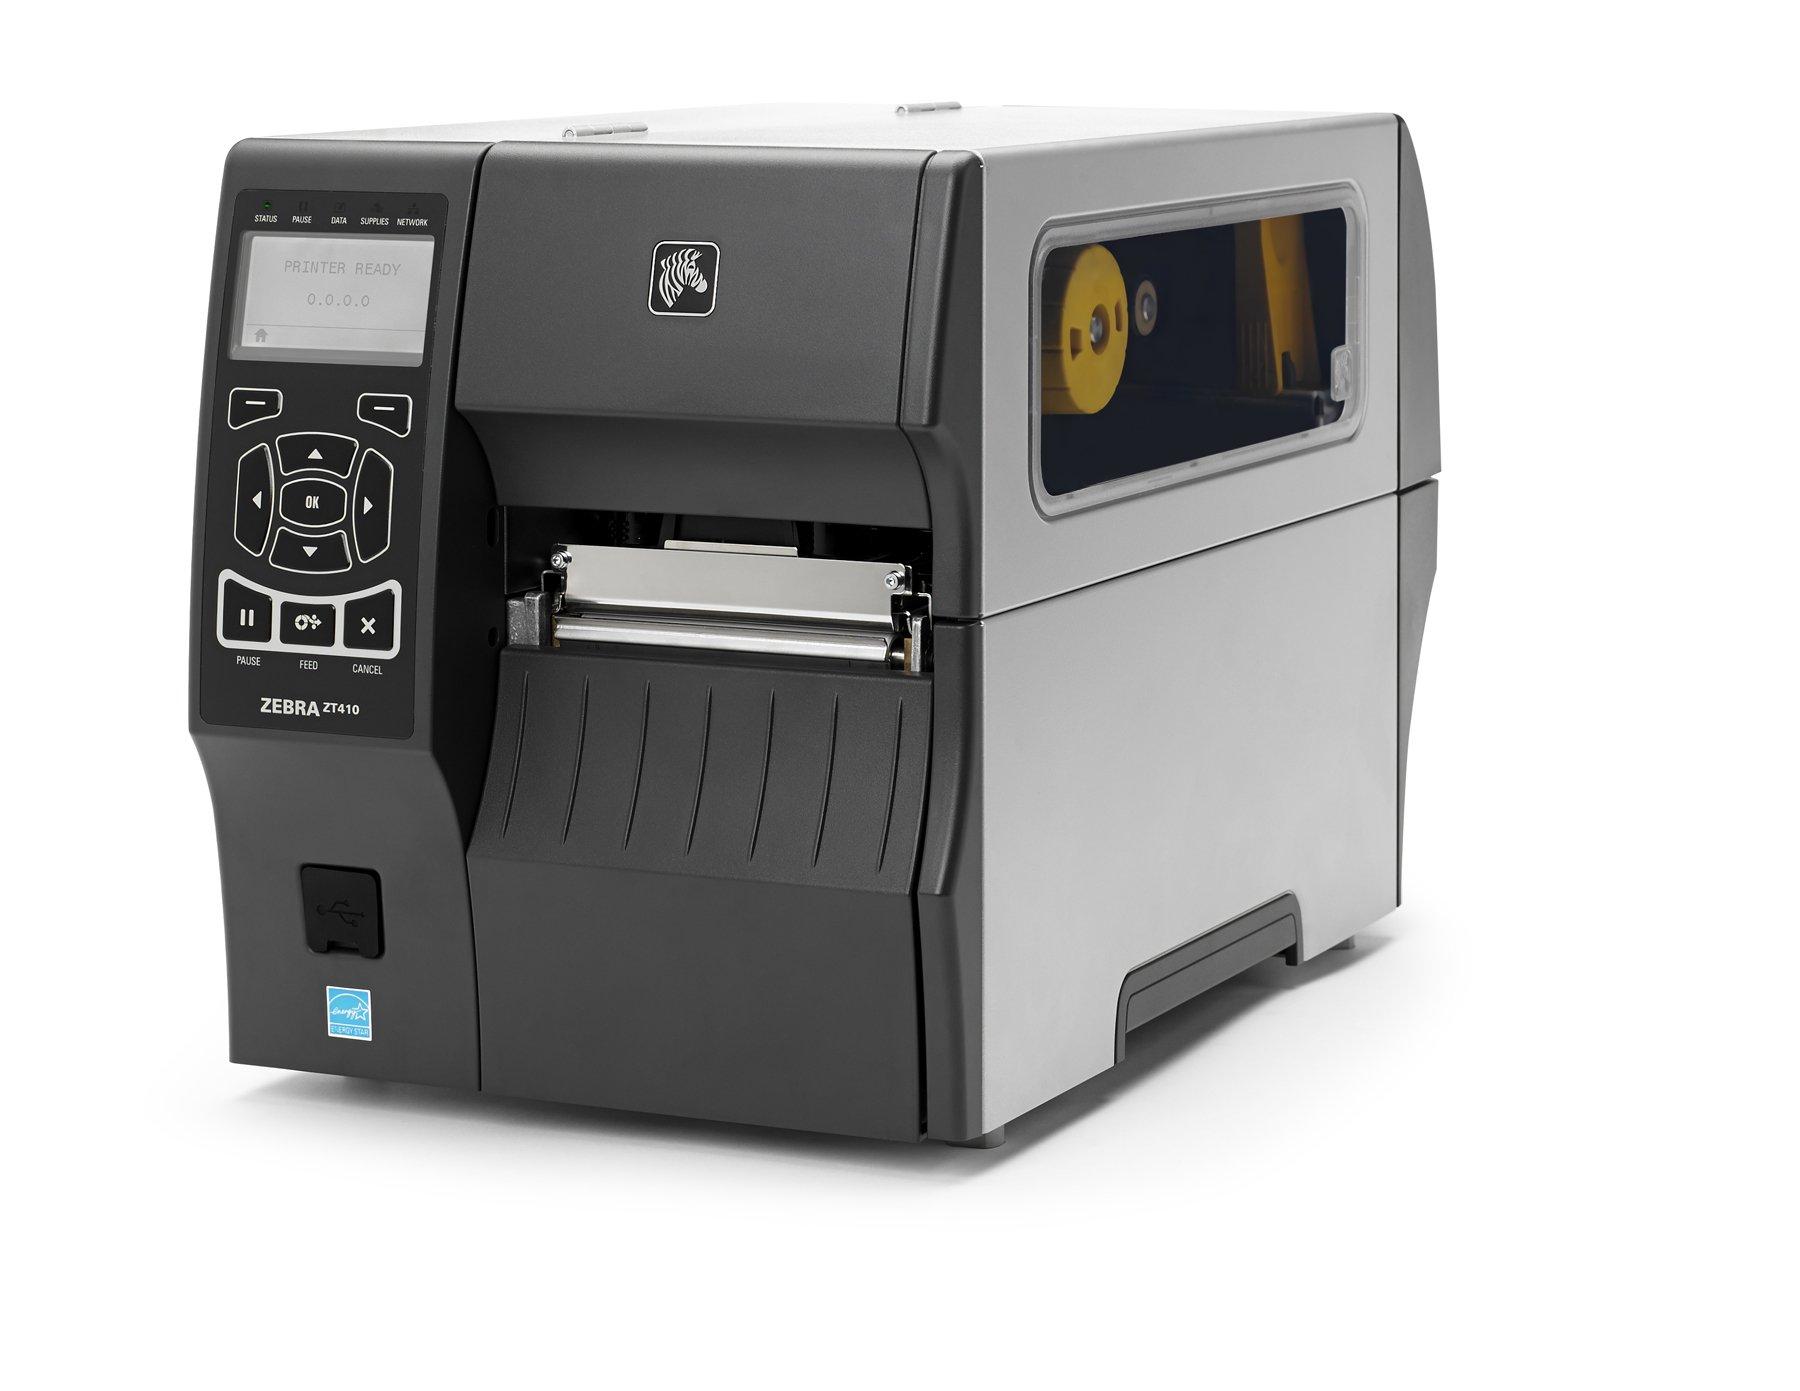 "Zebra Technologies ZT41046-T010000Z Series ZT410 4"" DT/TT Tabletop Printer, 600 dpi Resolution, Tear Bar, Power Cord with US Plug, USB 2.0/RS-232 Serial/10/100 Ethernet, Bluetooth 2.1, EZPL"